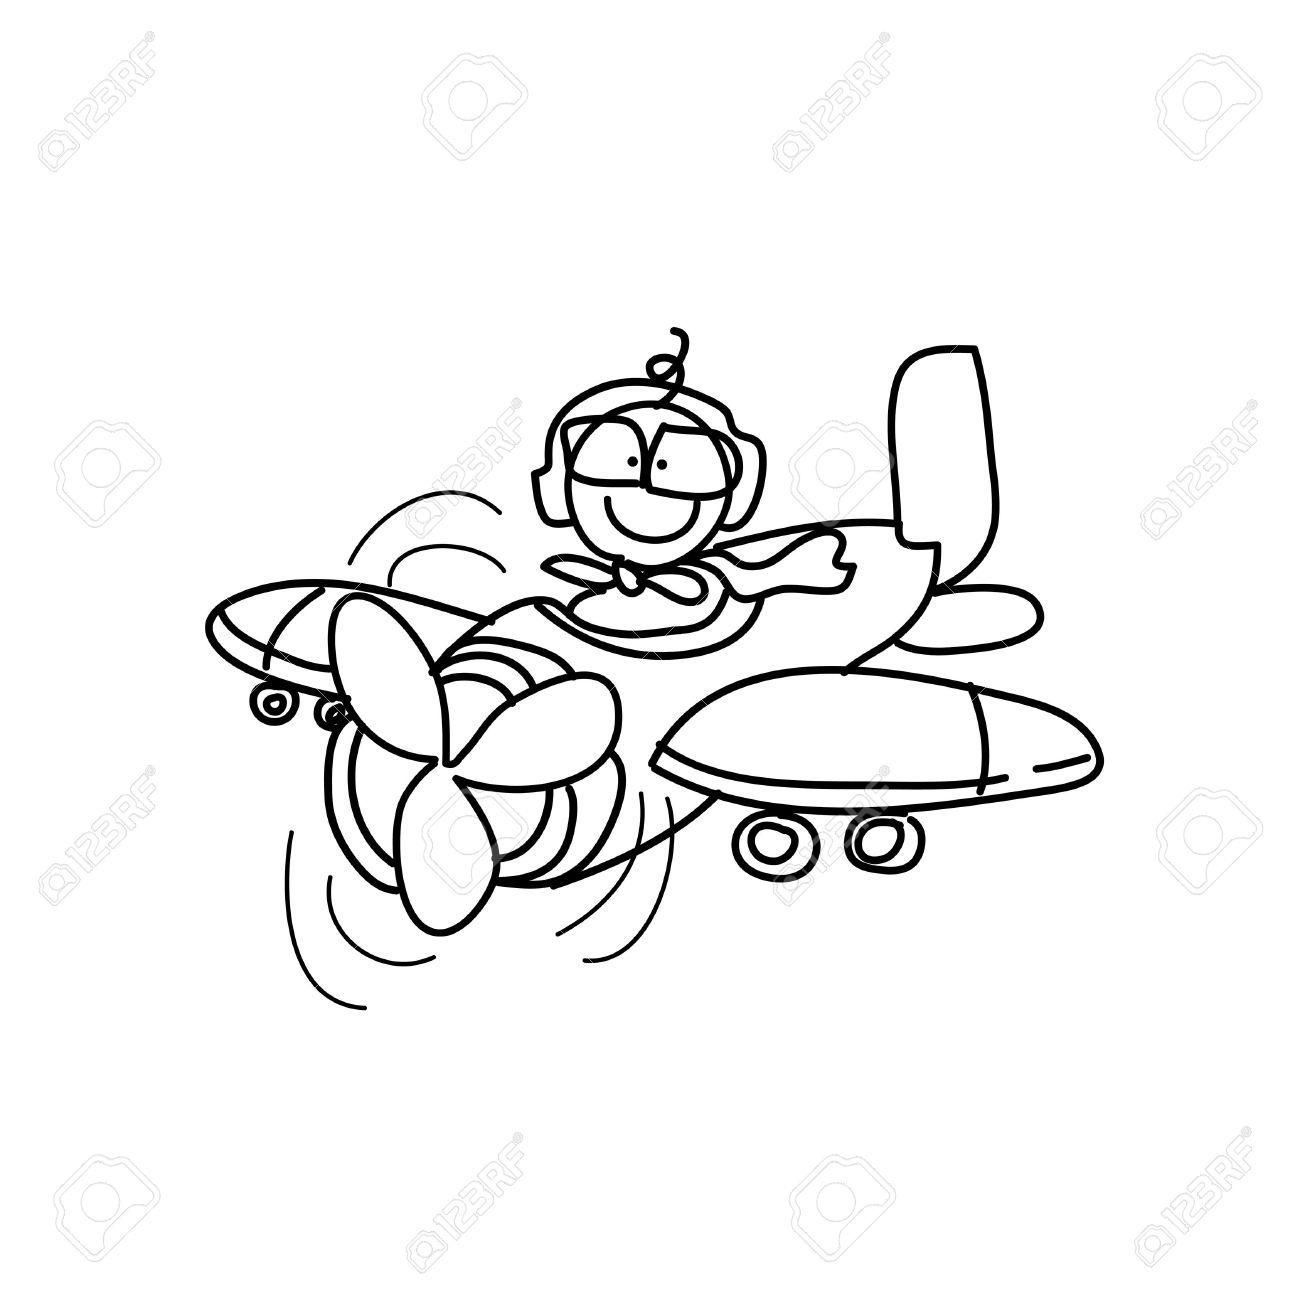 1300x1300 Cartoon Plane Drawing Cartoon Hand Drawing Imagination